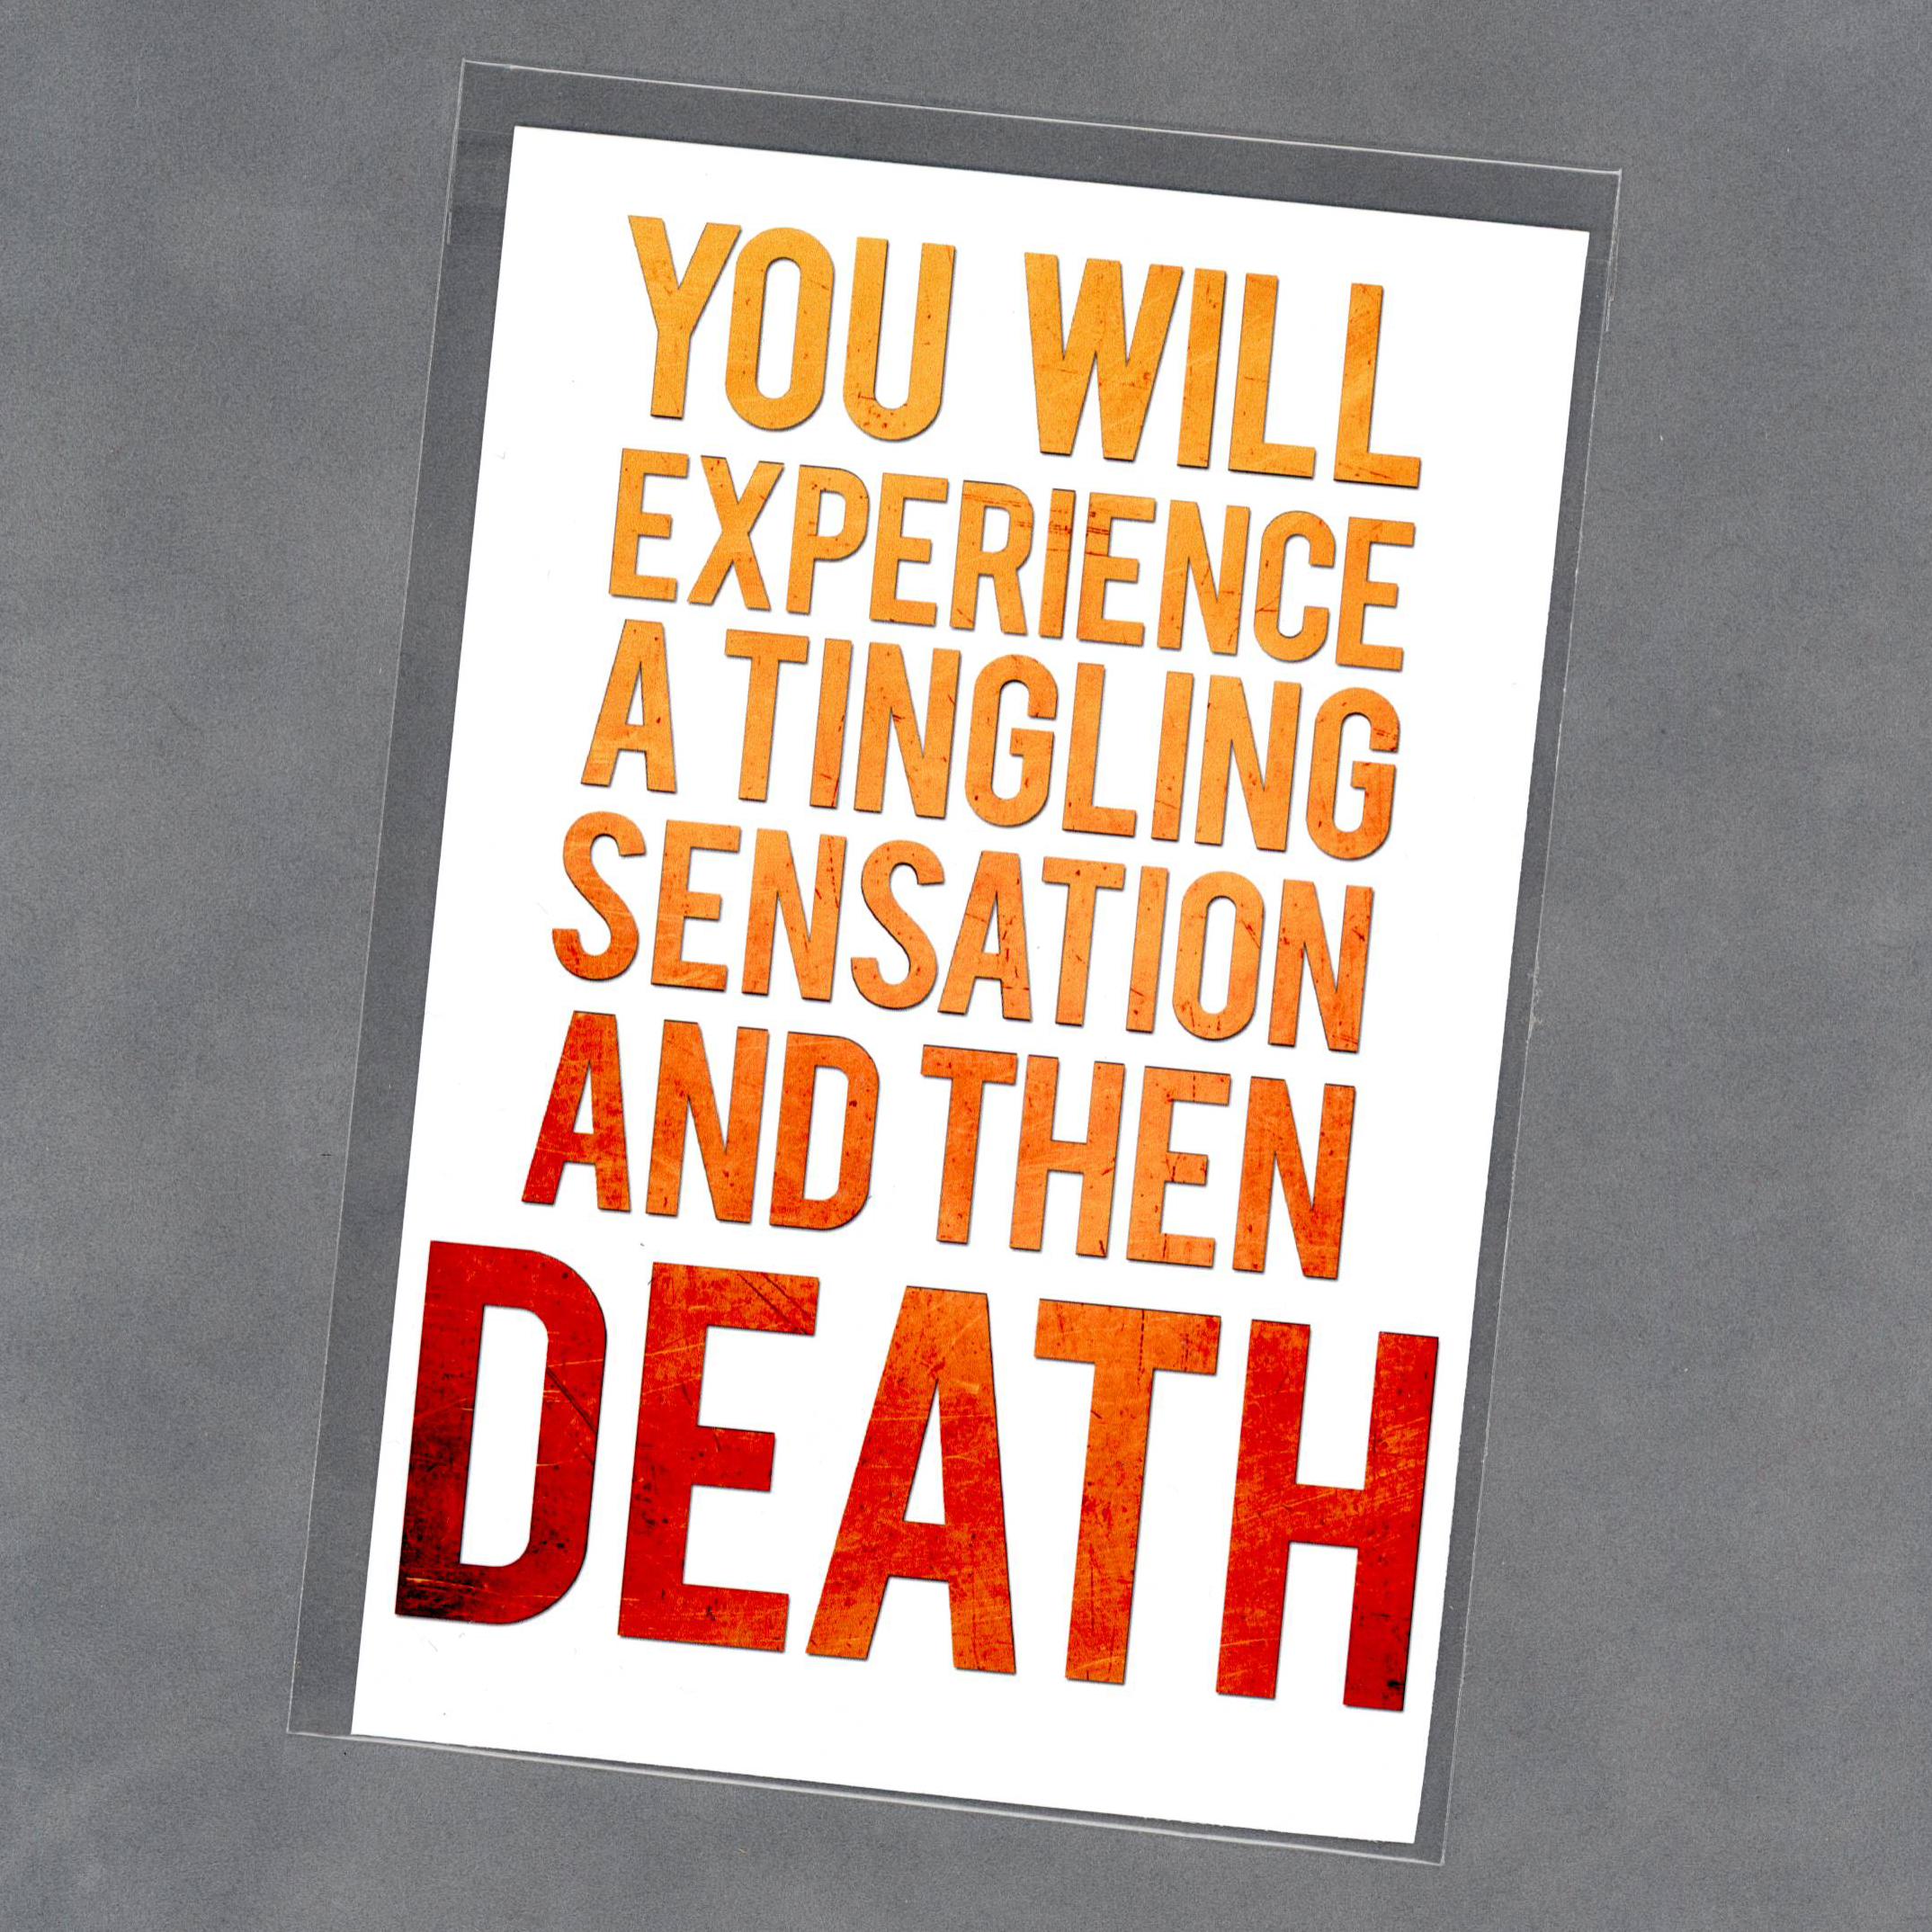 TinglingSensation_sale_4x6